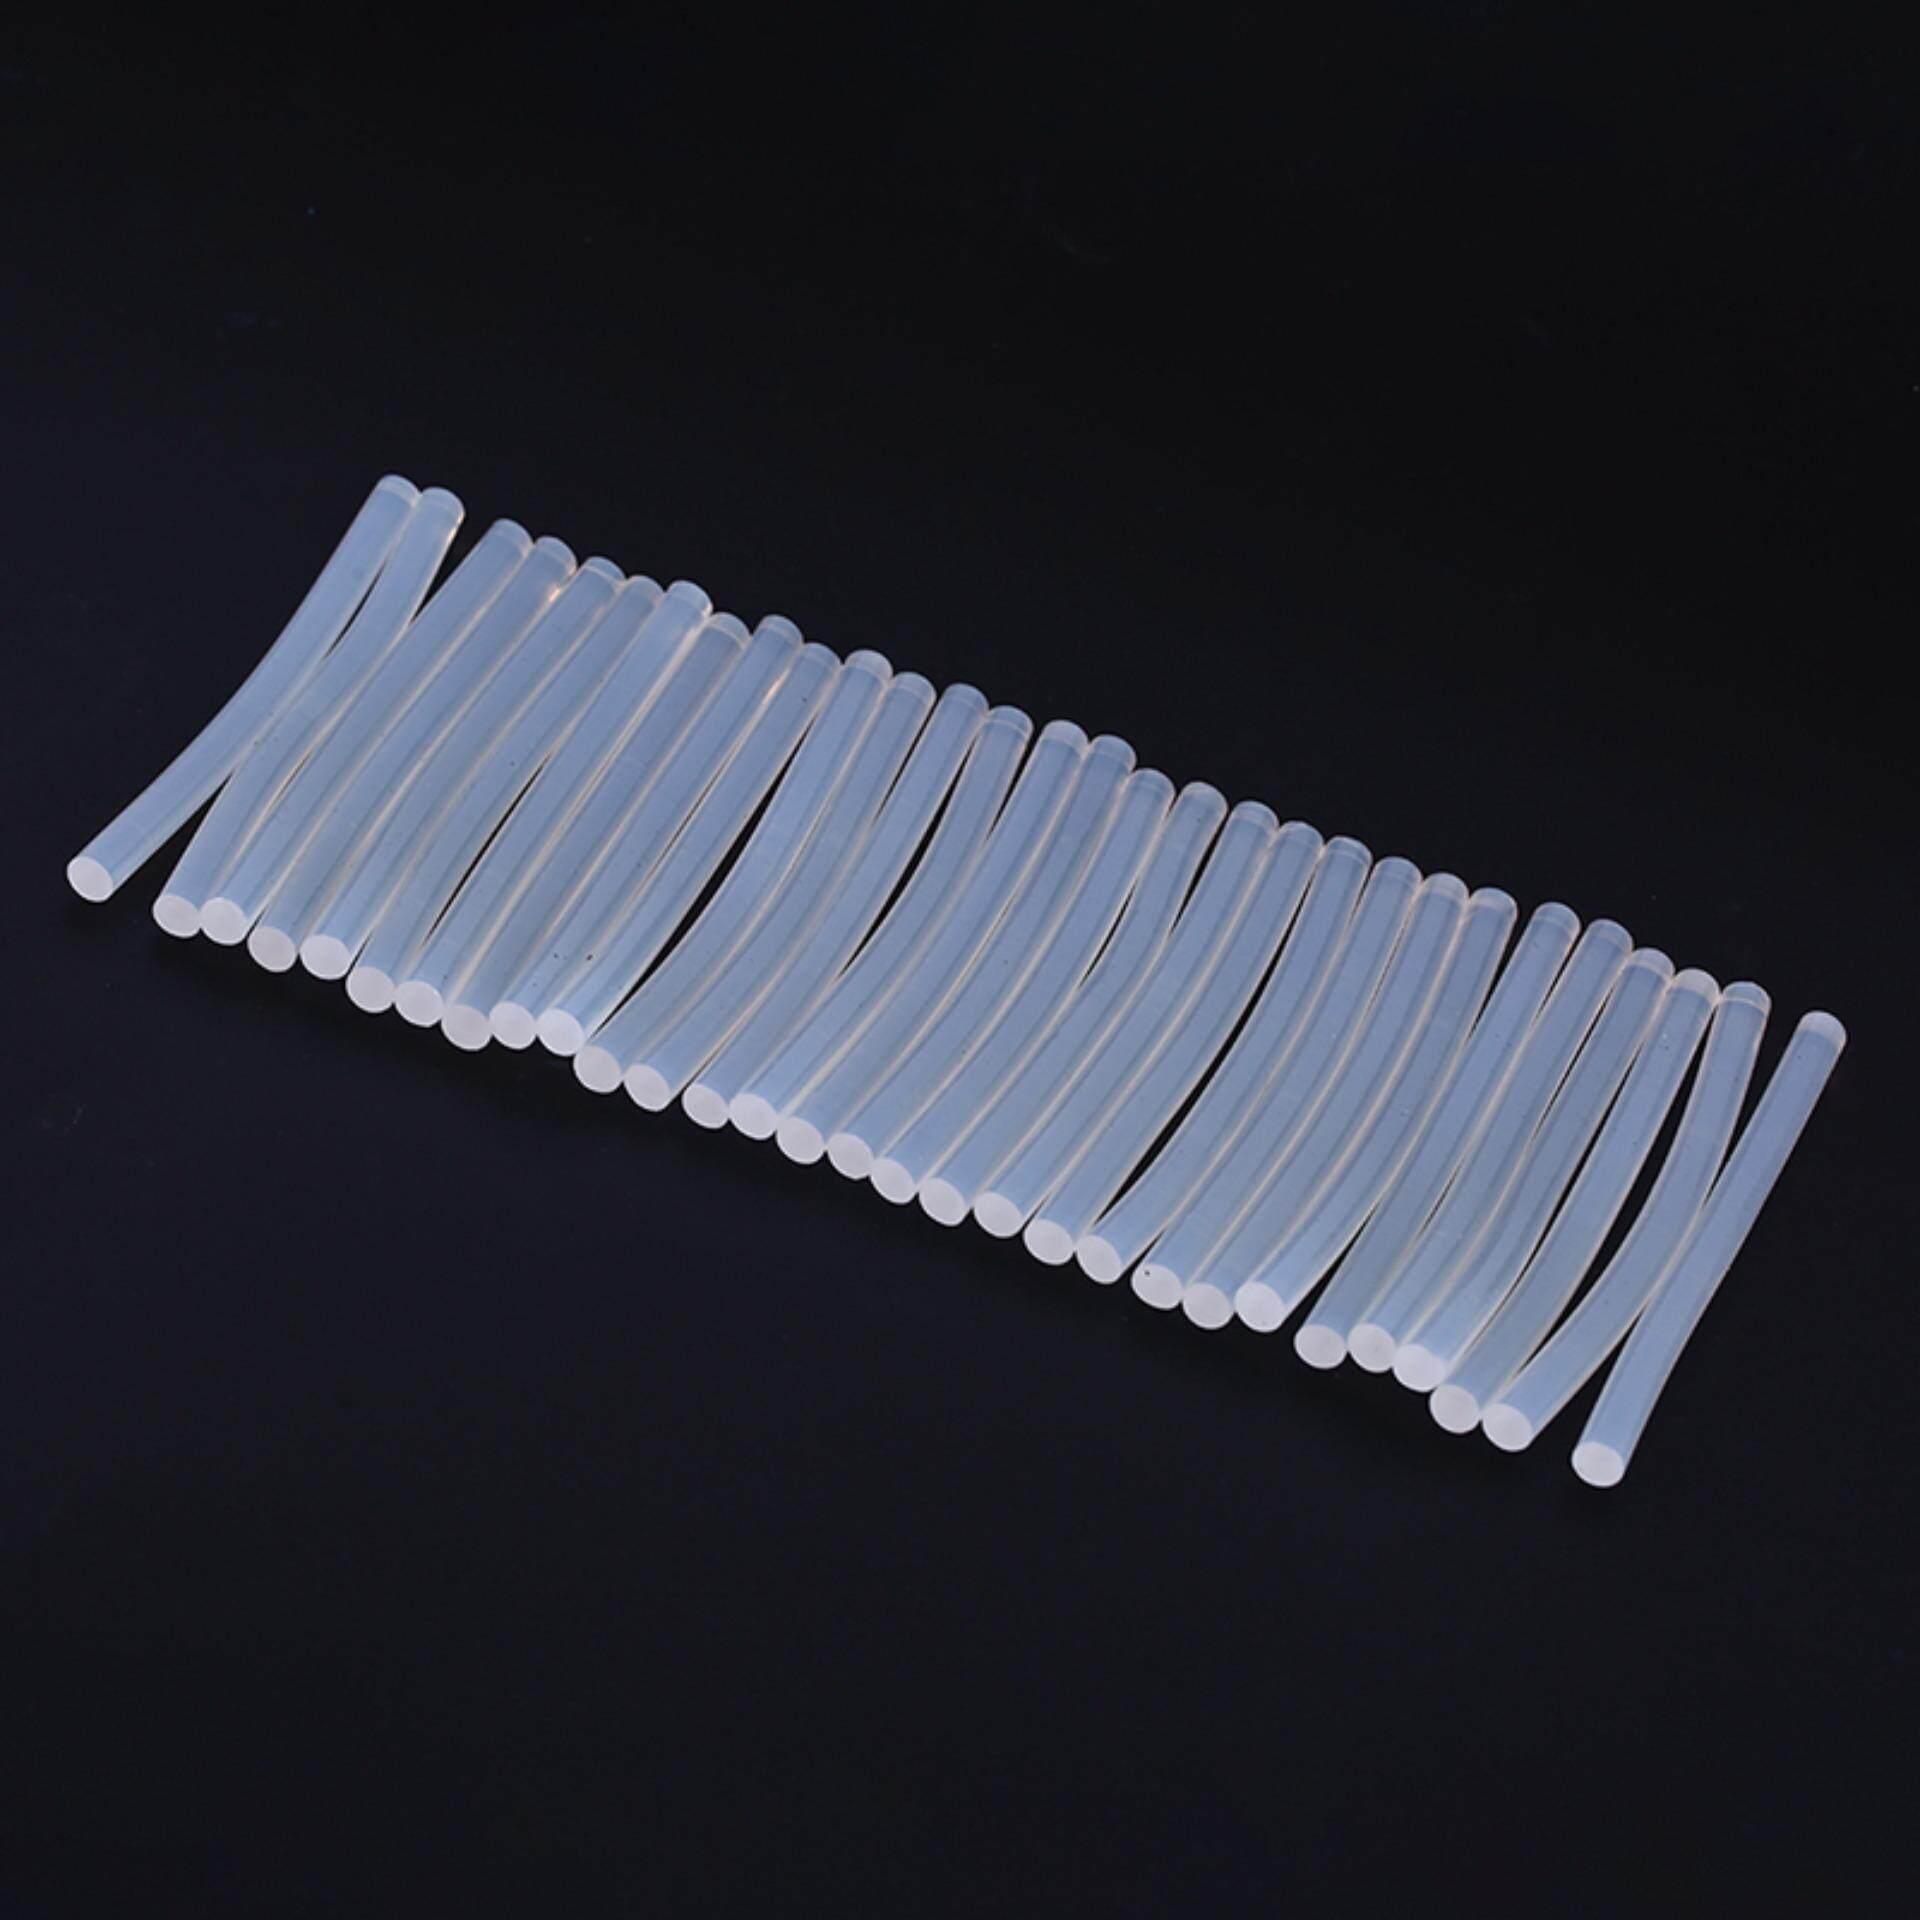 Sissi 30pcs Mini Melt Glue Sticks General Purpose Transparent Adhesive Stick 7mm